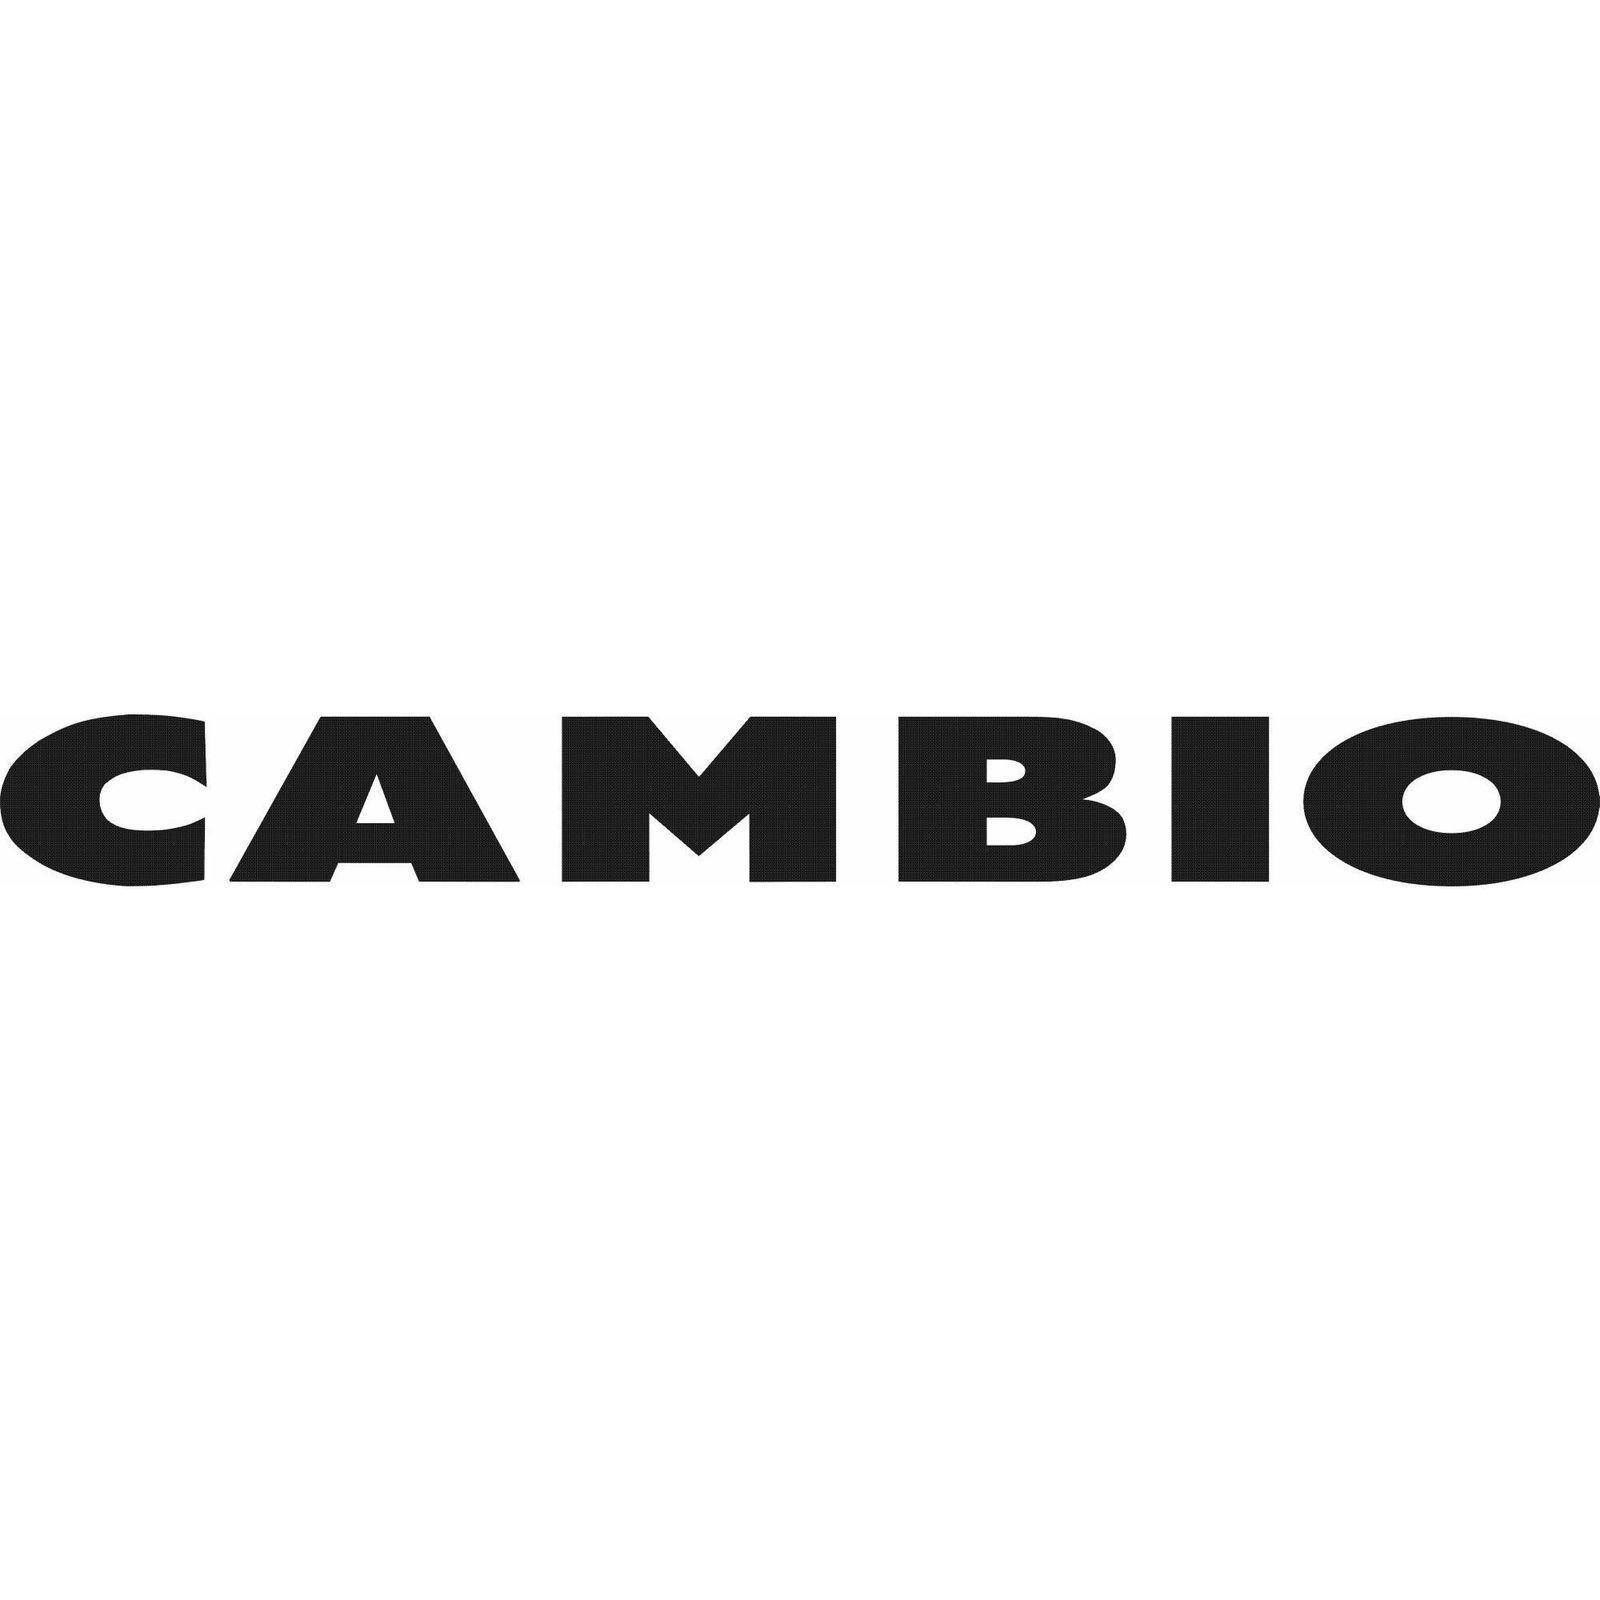 CAMBIO (Image 1)